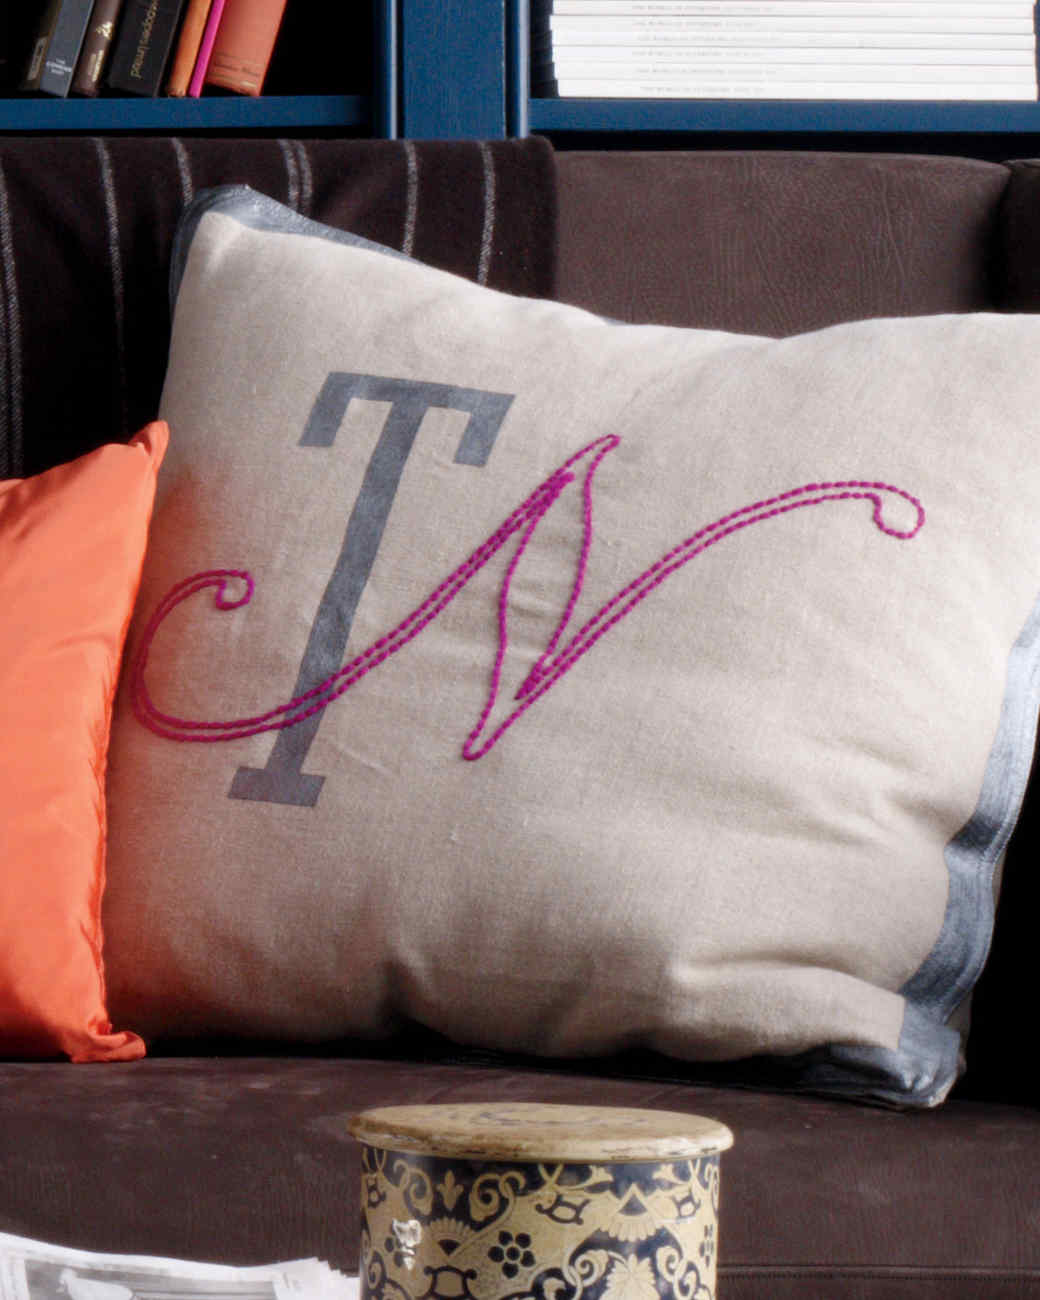 monogram-pillow-tn-0911mld106720.jpg